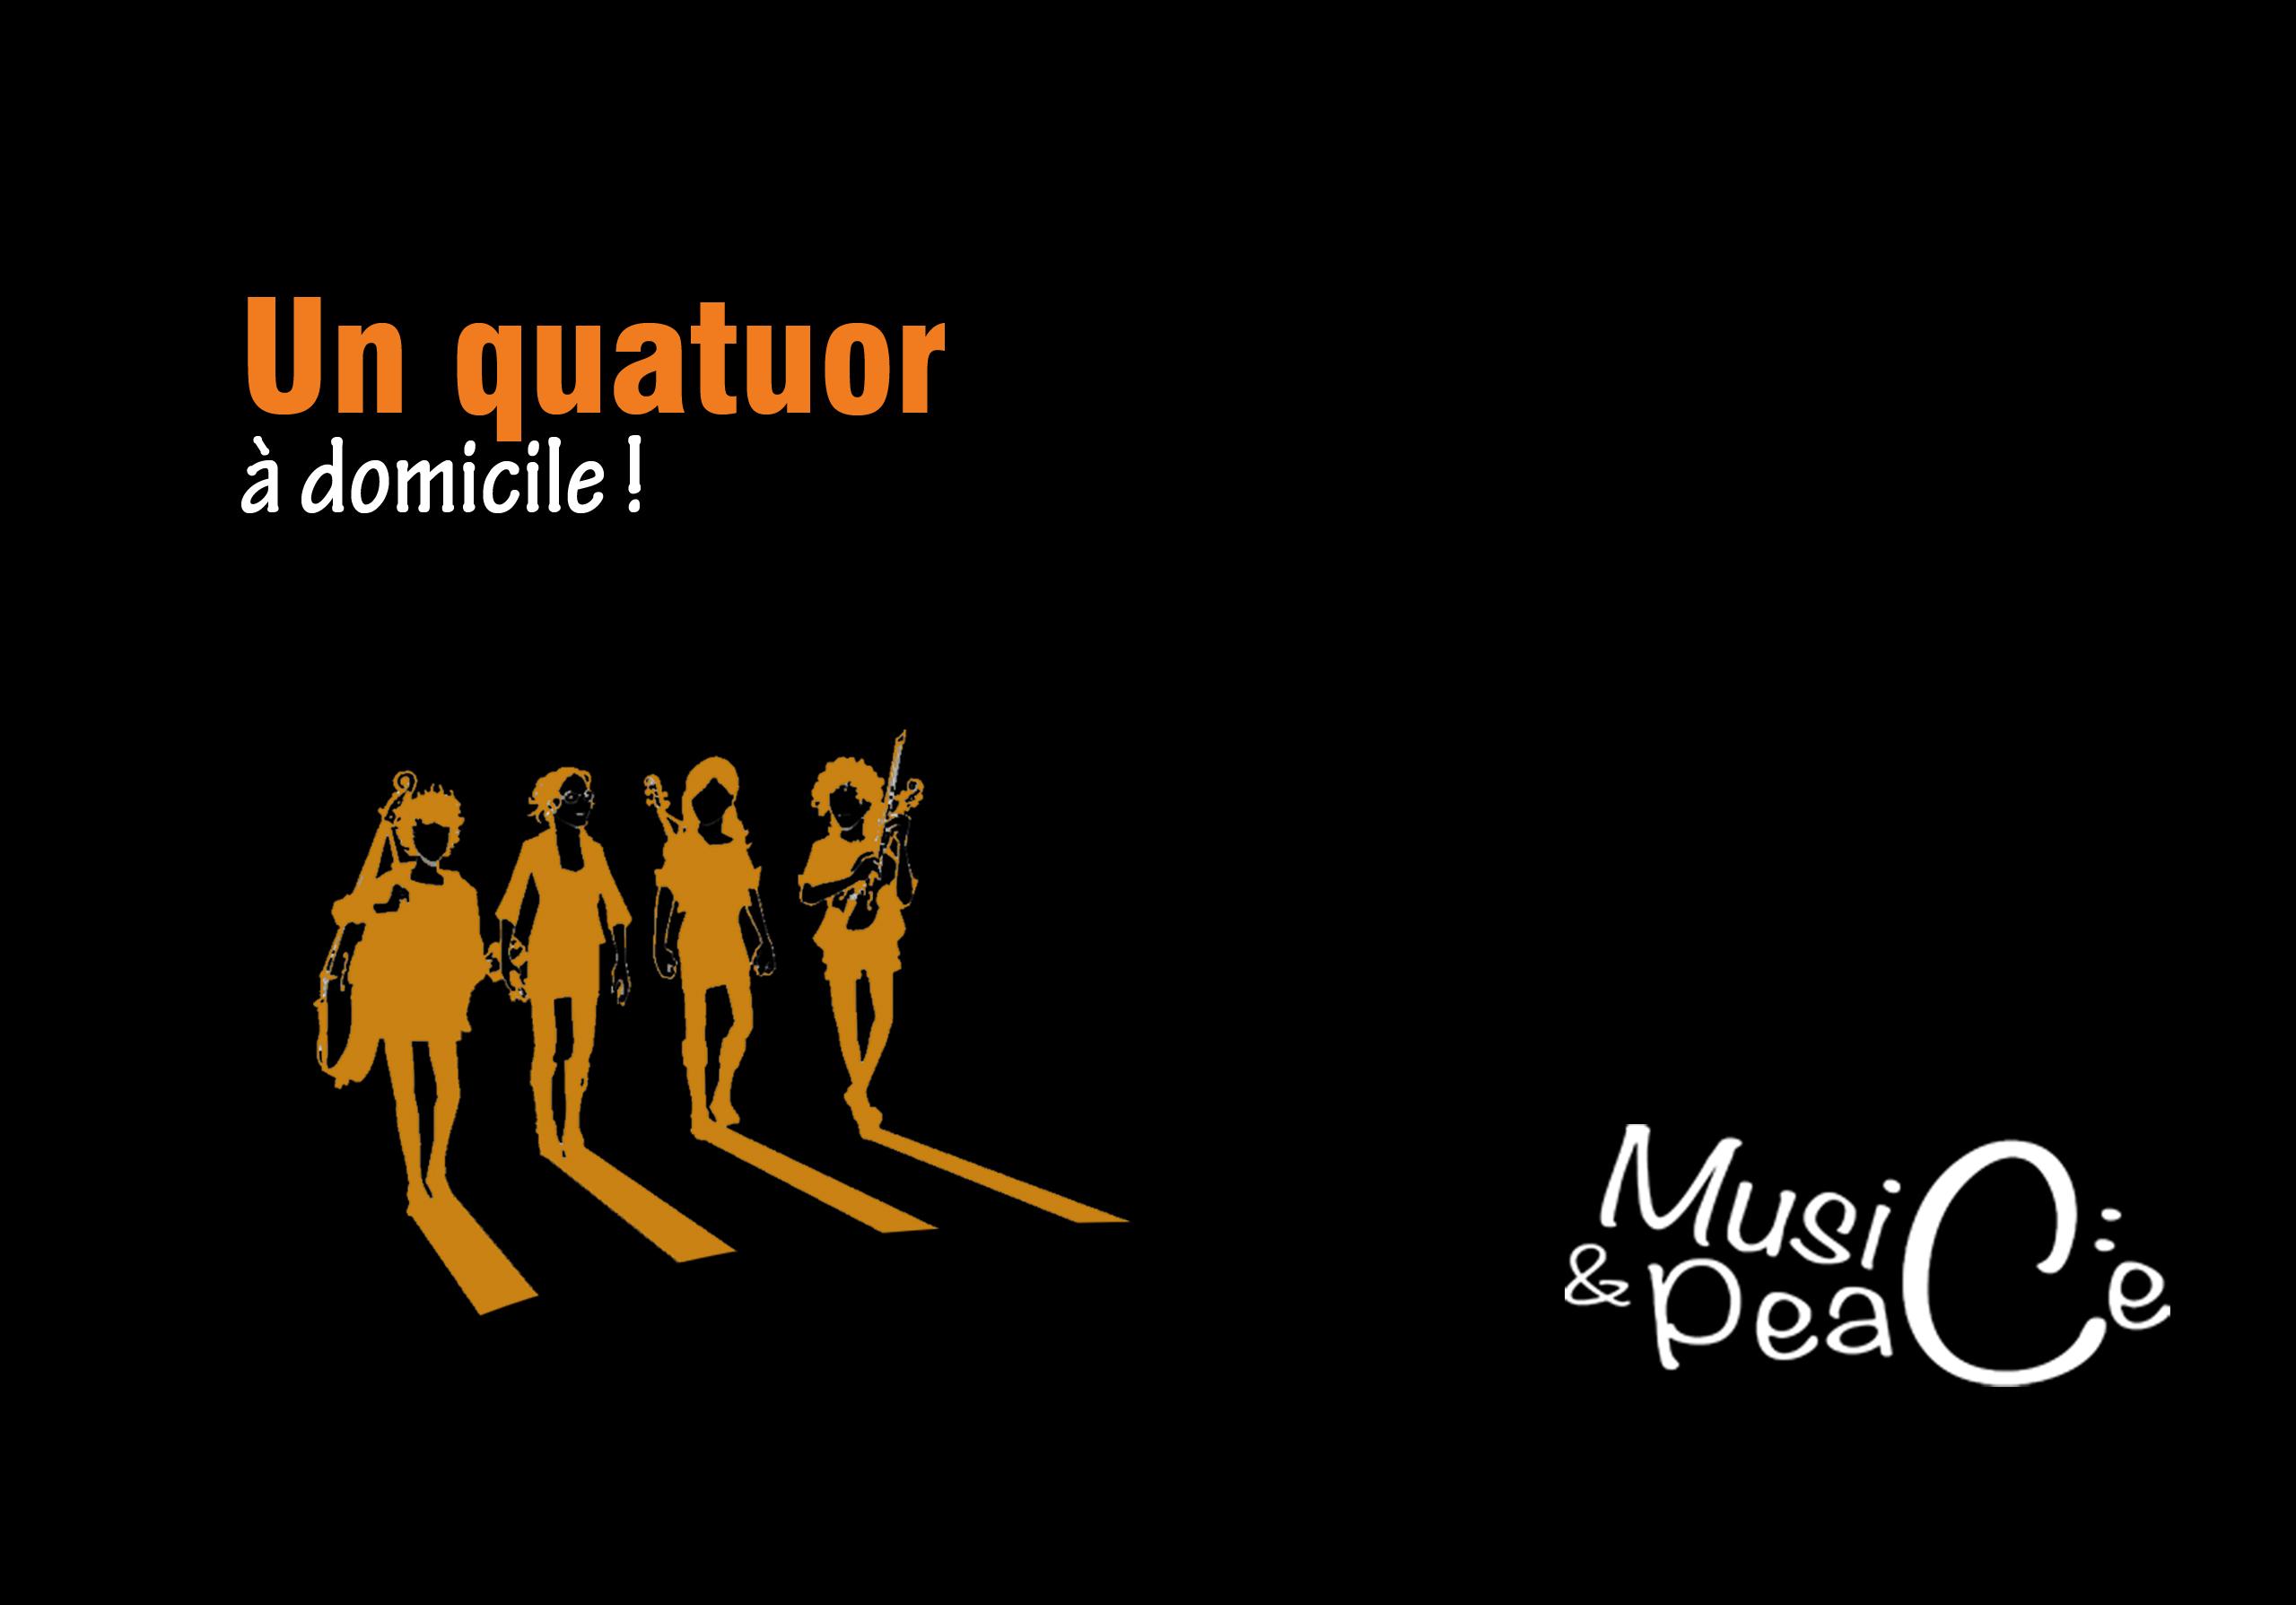 quatuor2-1422455815.jpg